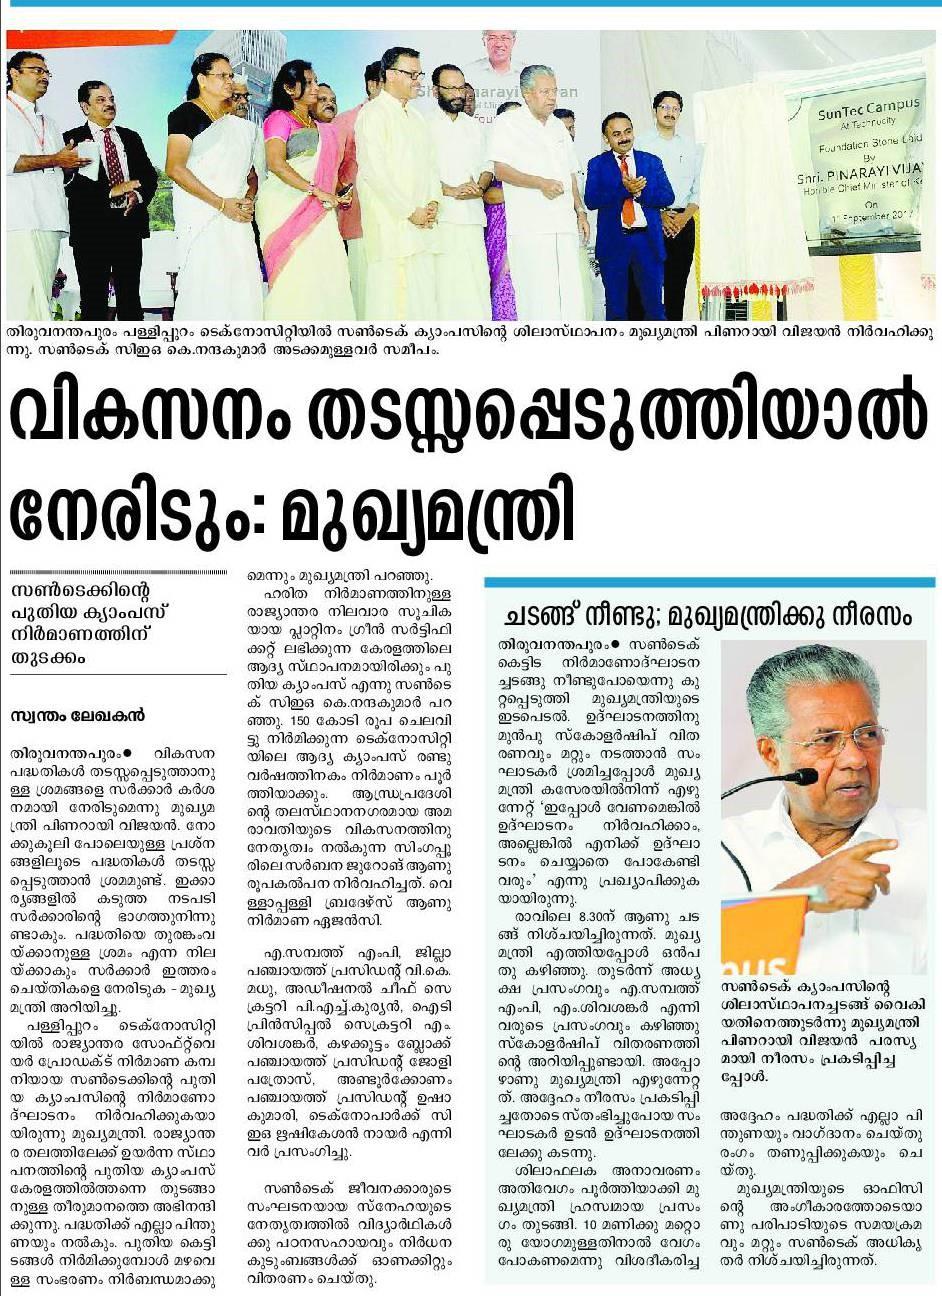 Against anti-development forces